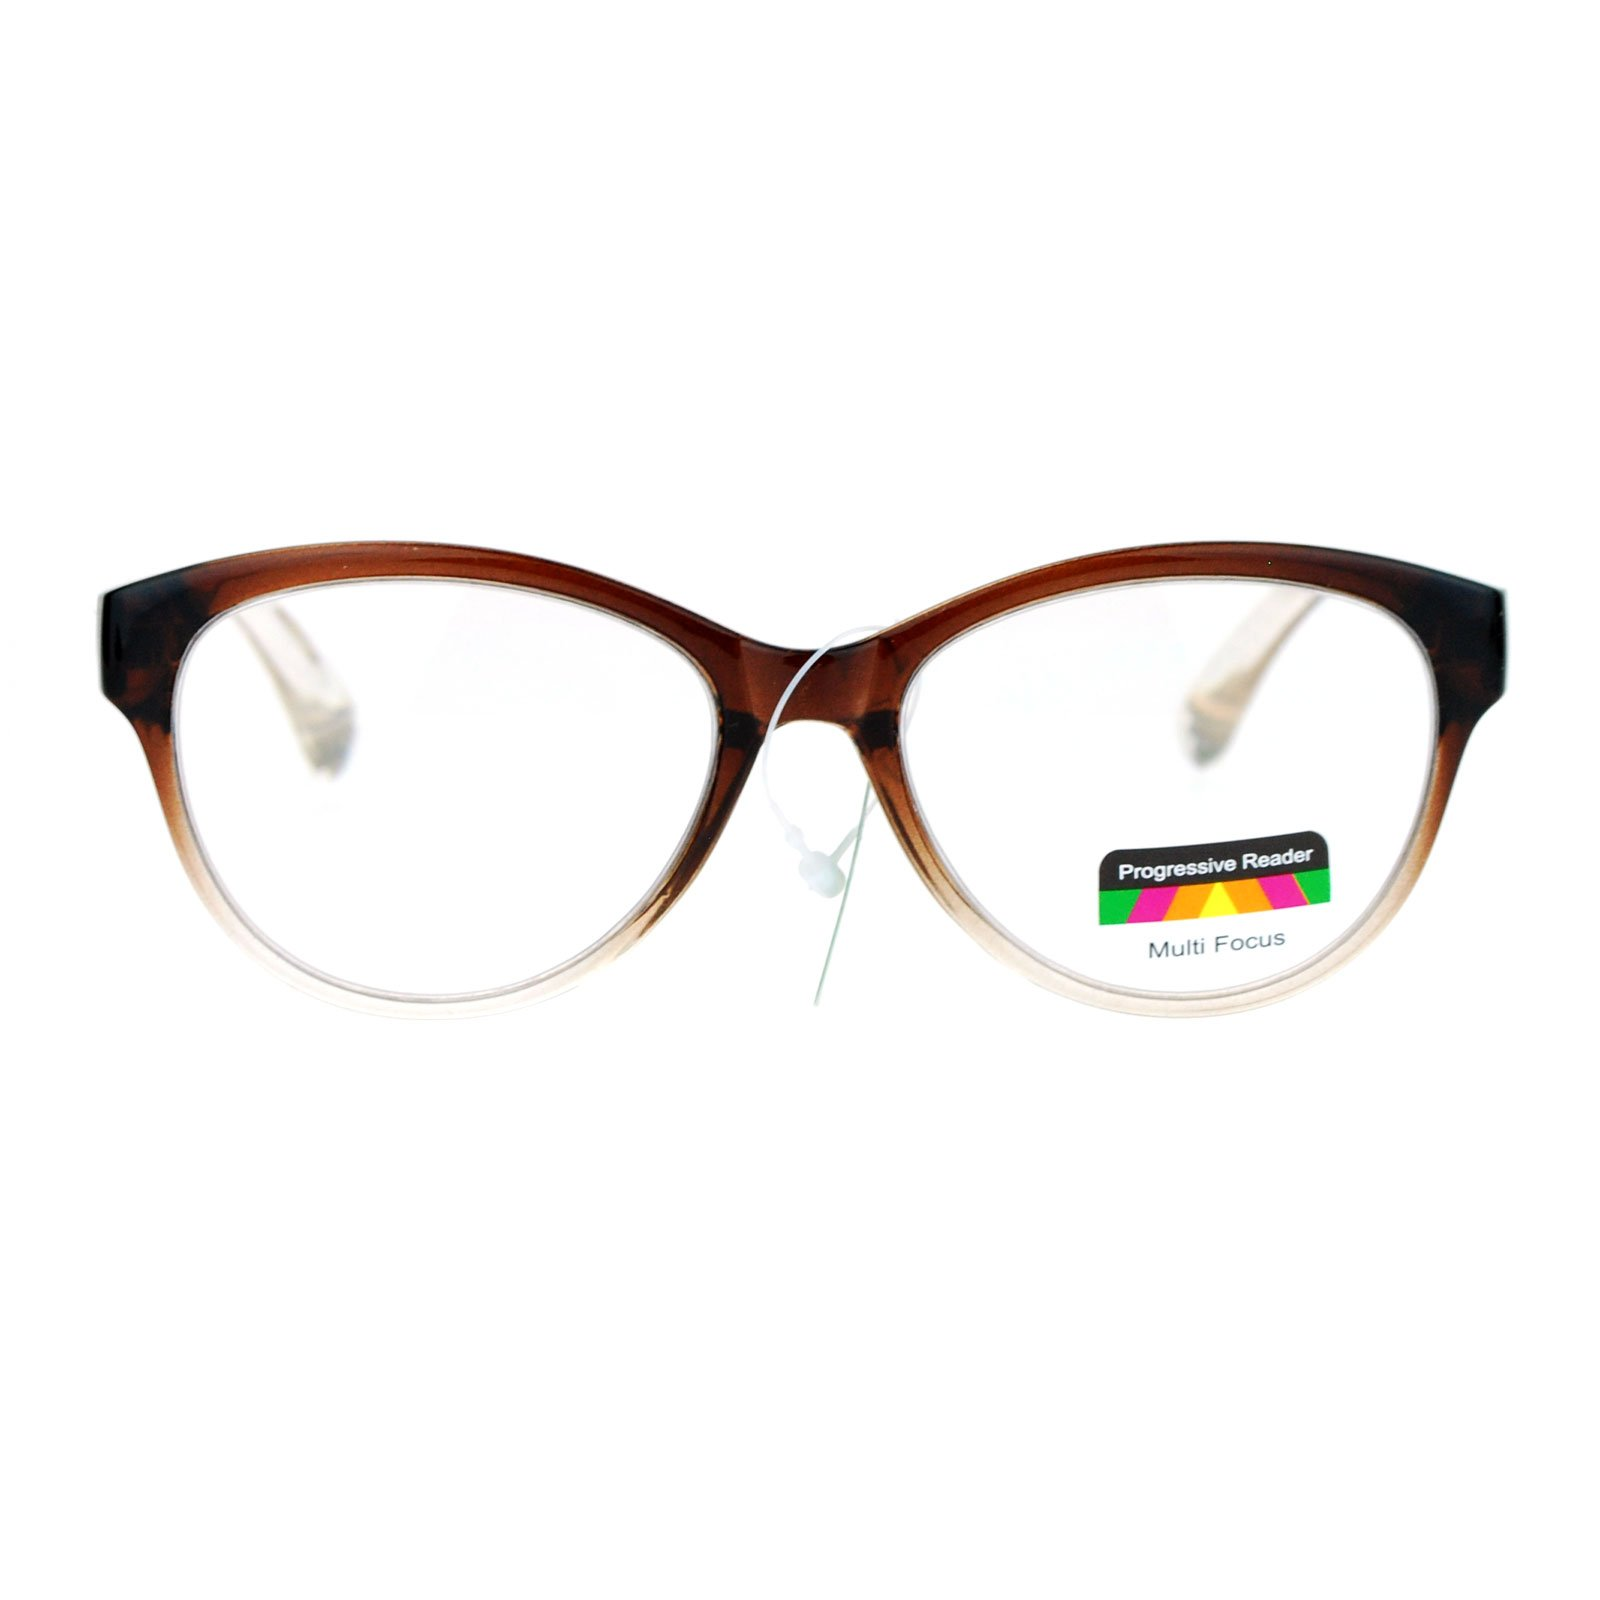 SA106 Cat Eye Multi 3 Focus Progressive Reading Glasses Brown 2.0